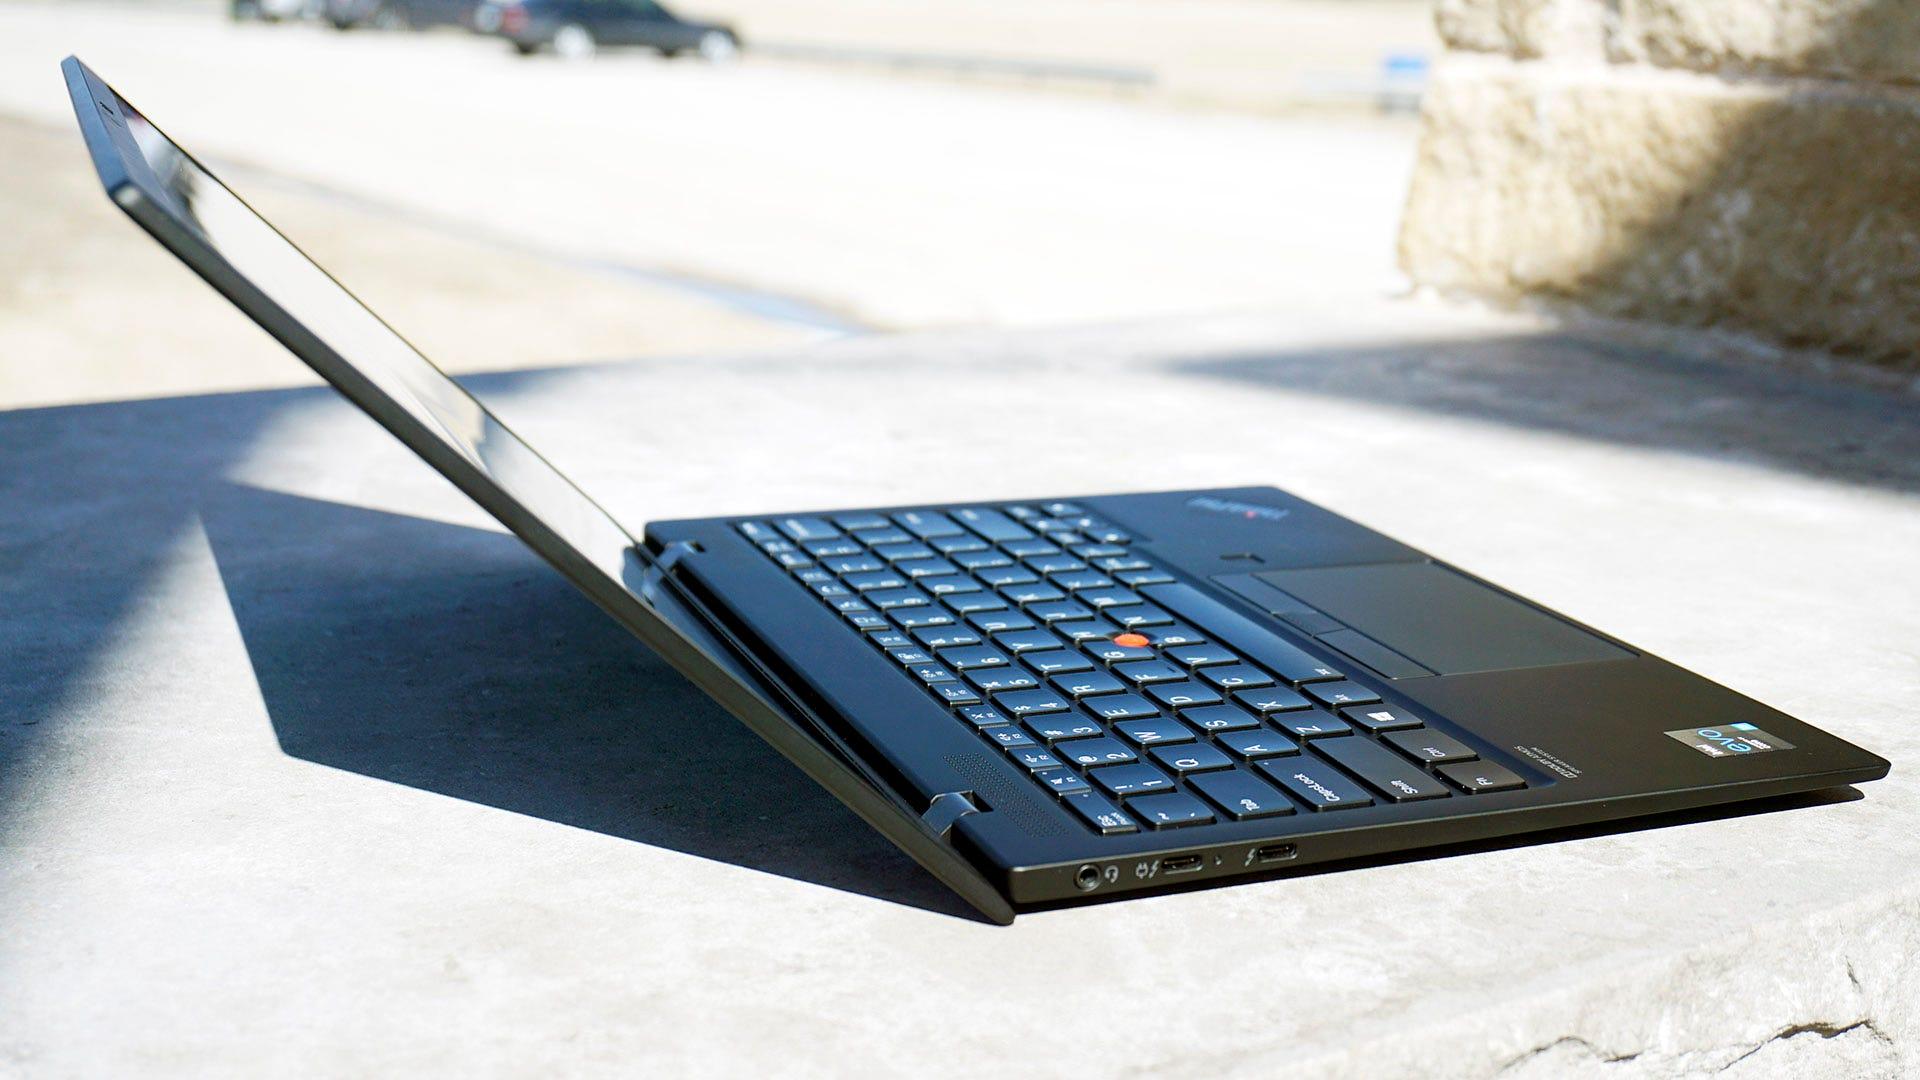 ThinkPad X1 Nano from the side